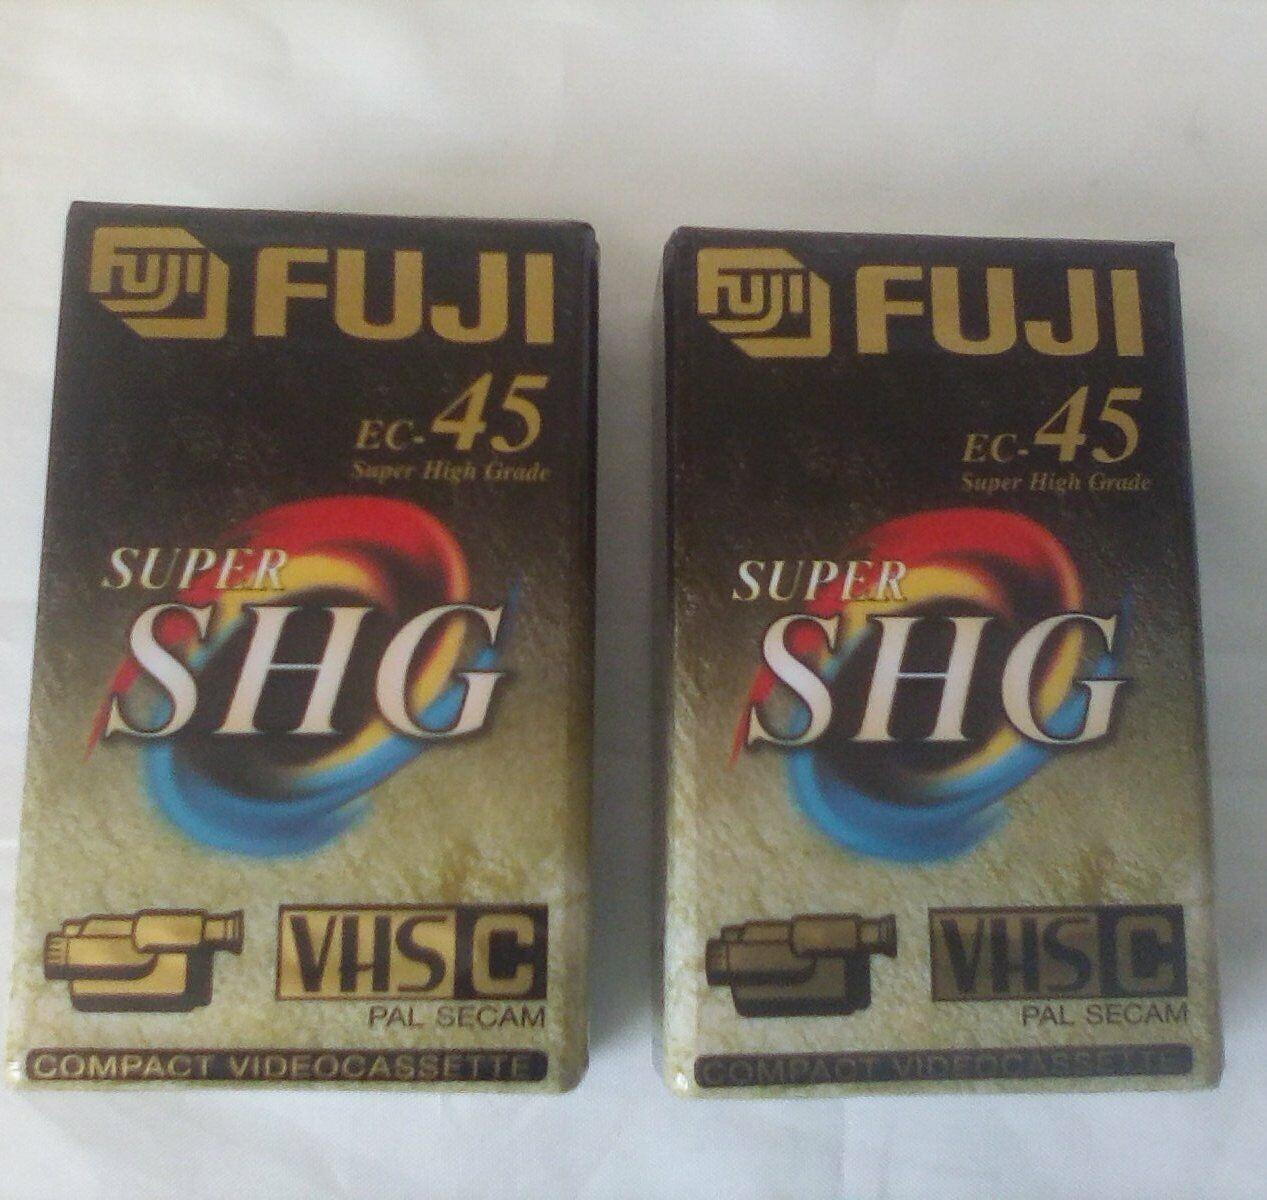 vhsc 2 x Fuji EC 45 Super SHG VHSC tapes New and sealed